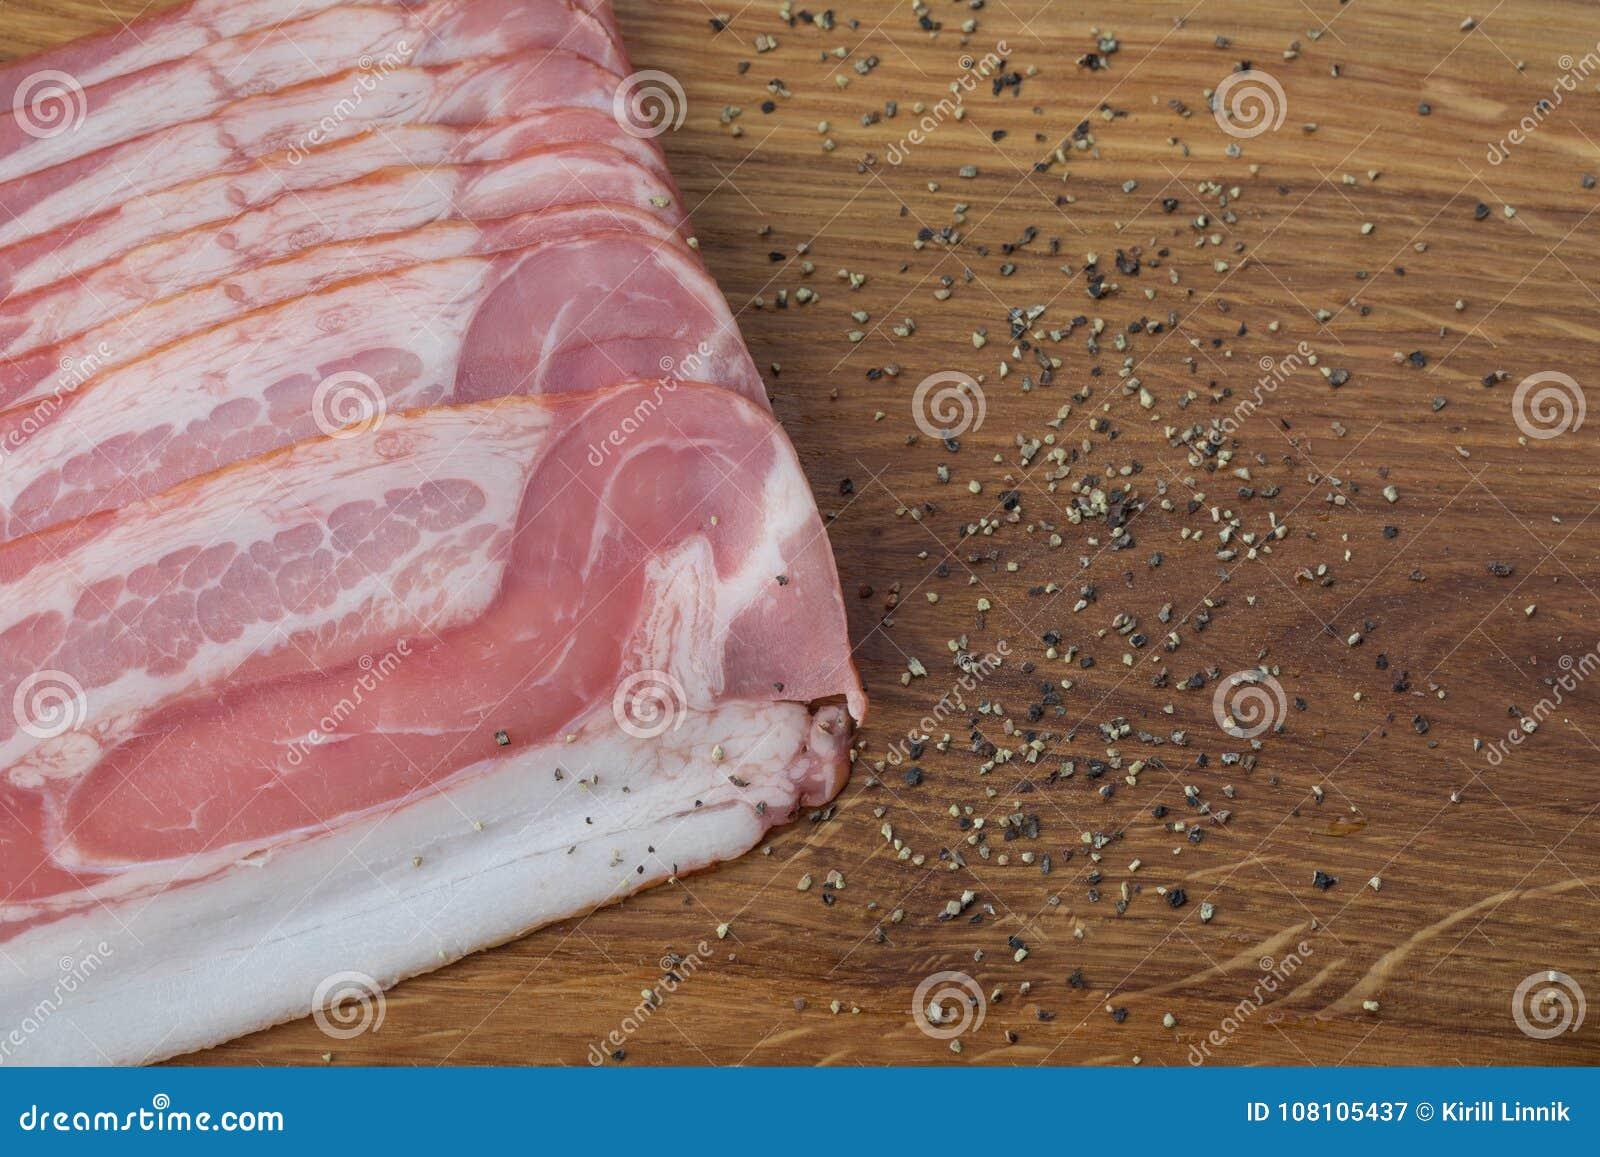 Download Ham on a wooden desk stock image. Image of prepared - 108105437